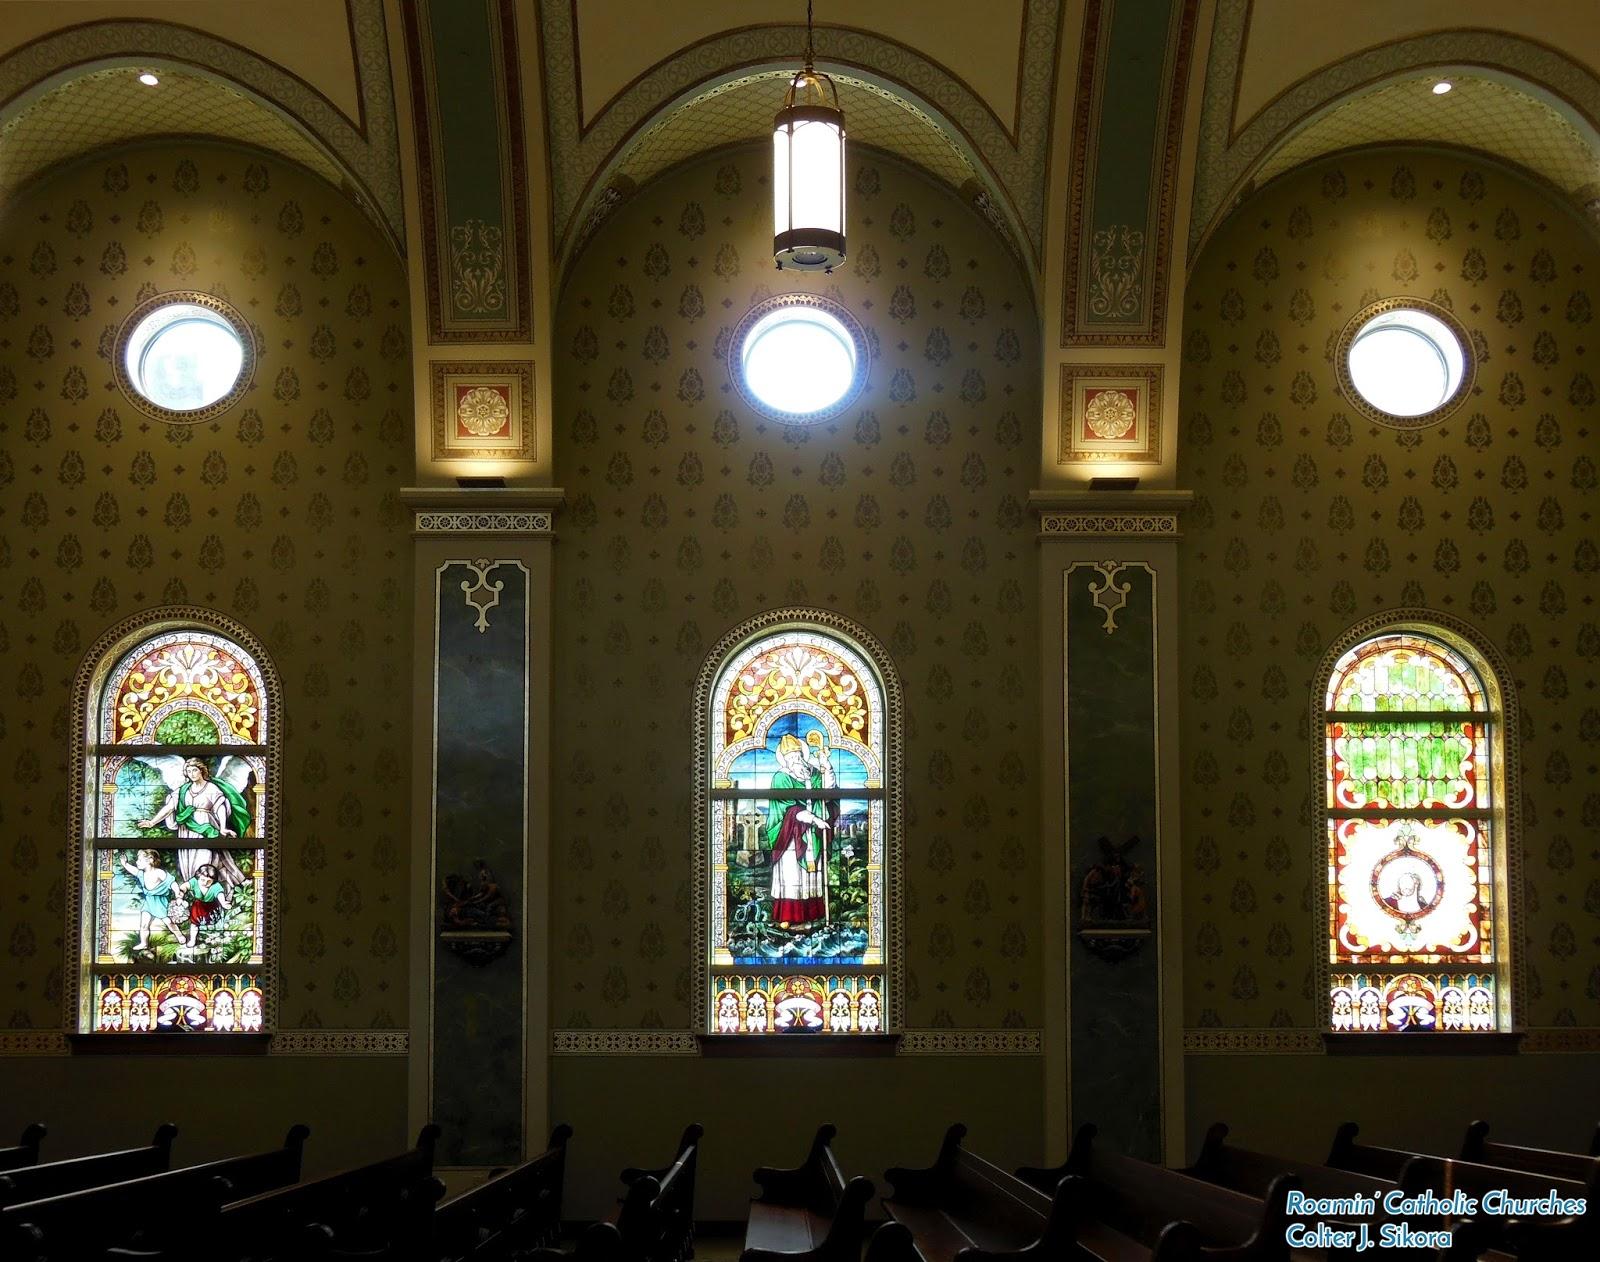 Roamin' Catholic Churches: A Look Inside the New St  Cecilia